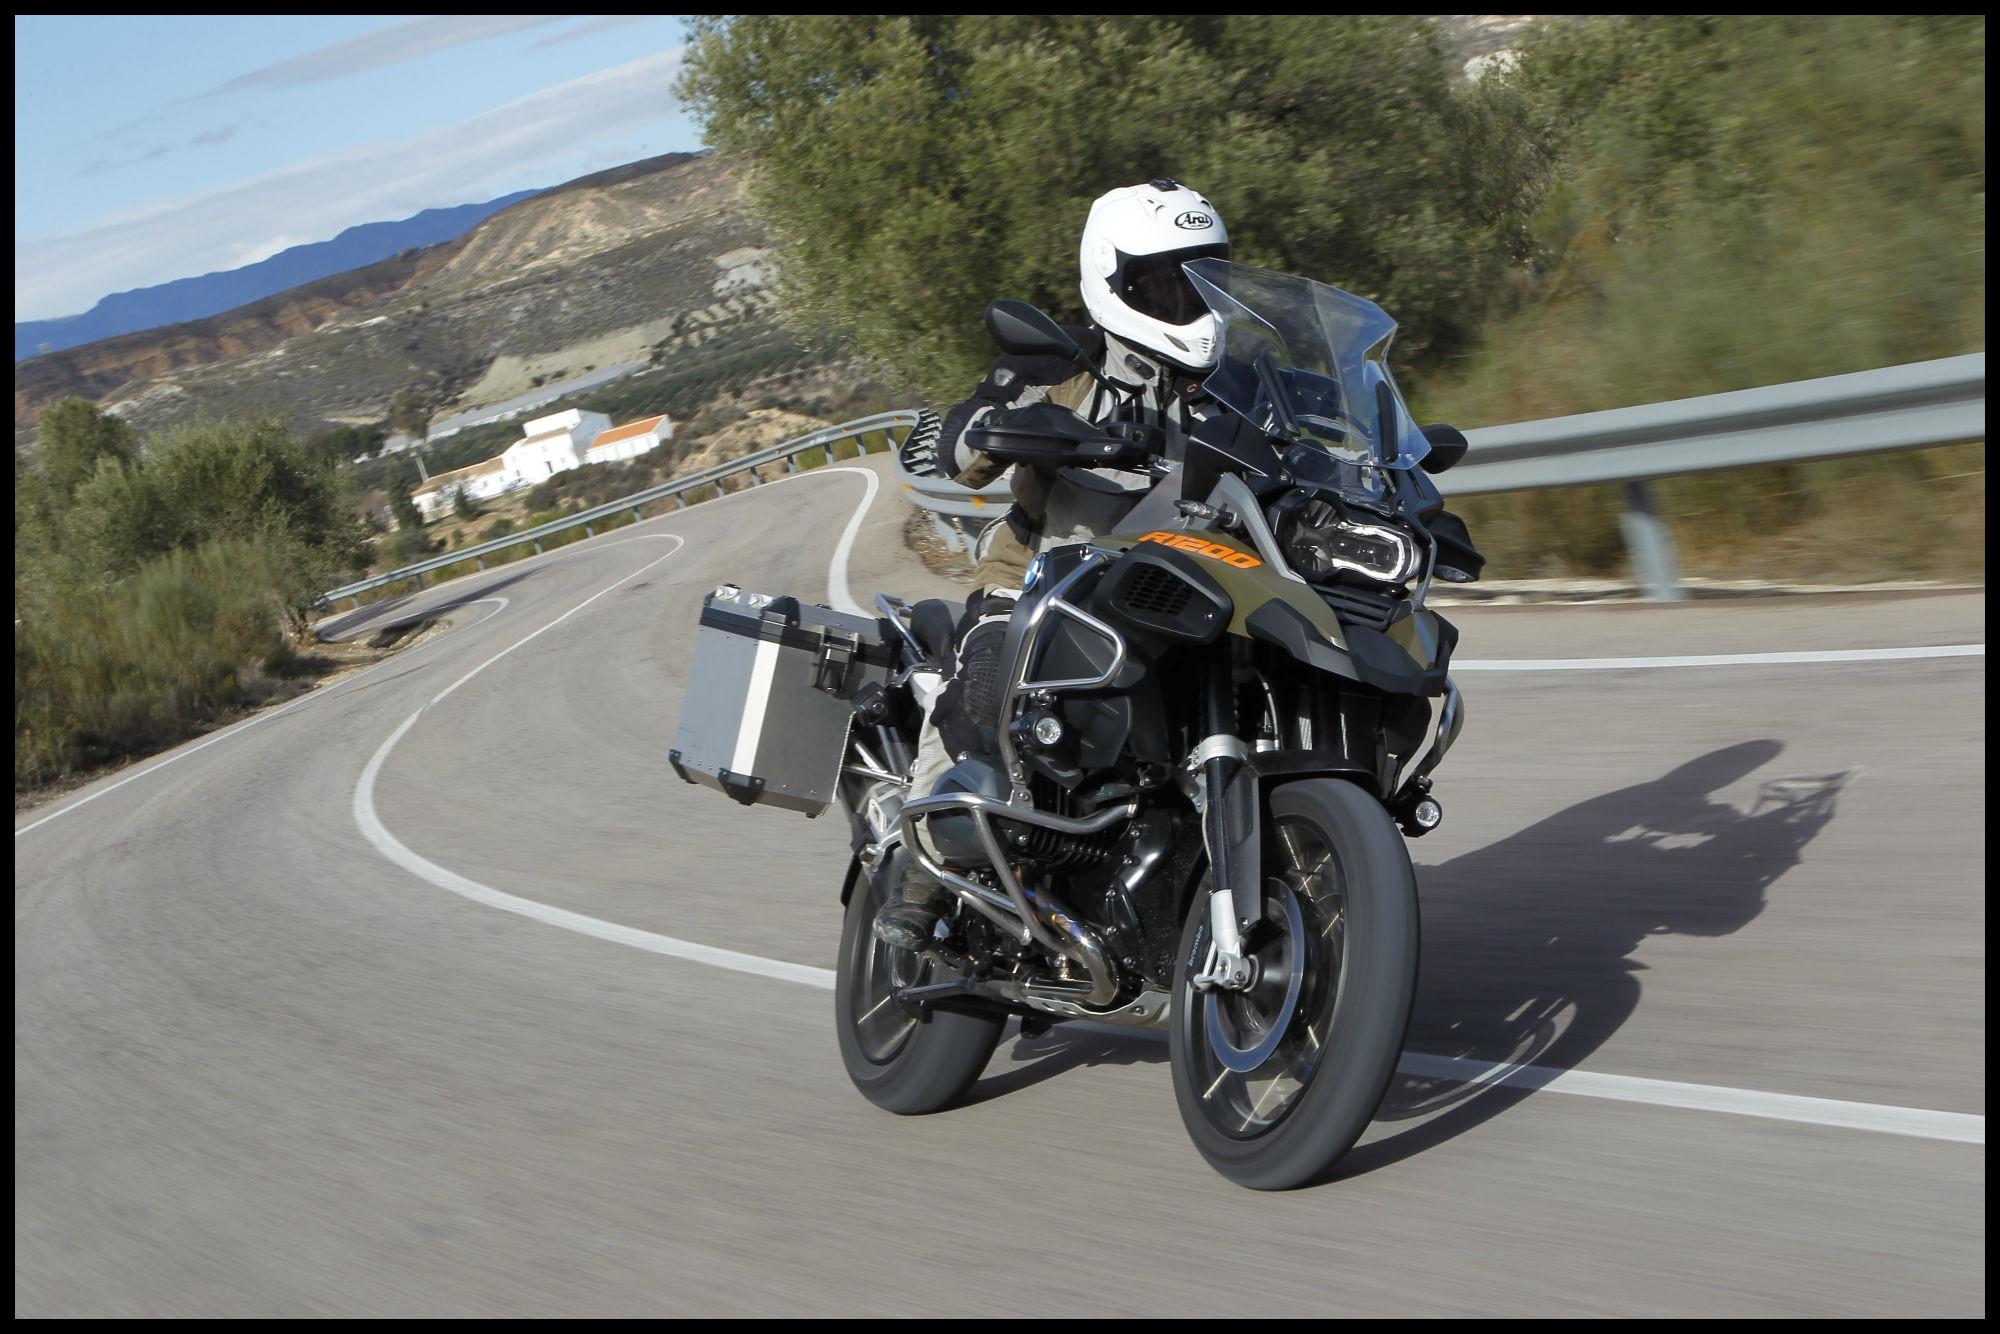 2018 Bmw R1200gs Adventure Accessories Inspirational Back to Back Test Bmw R1200gs Adventure